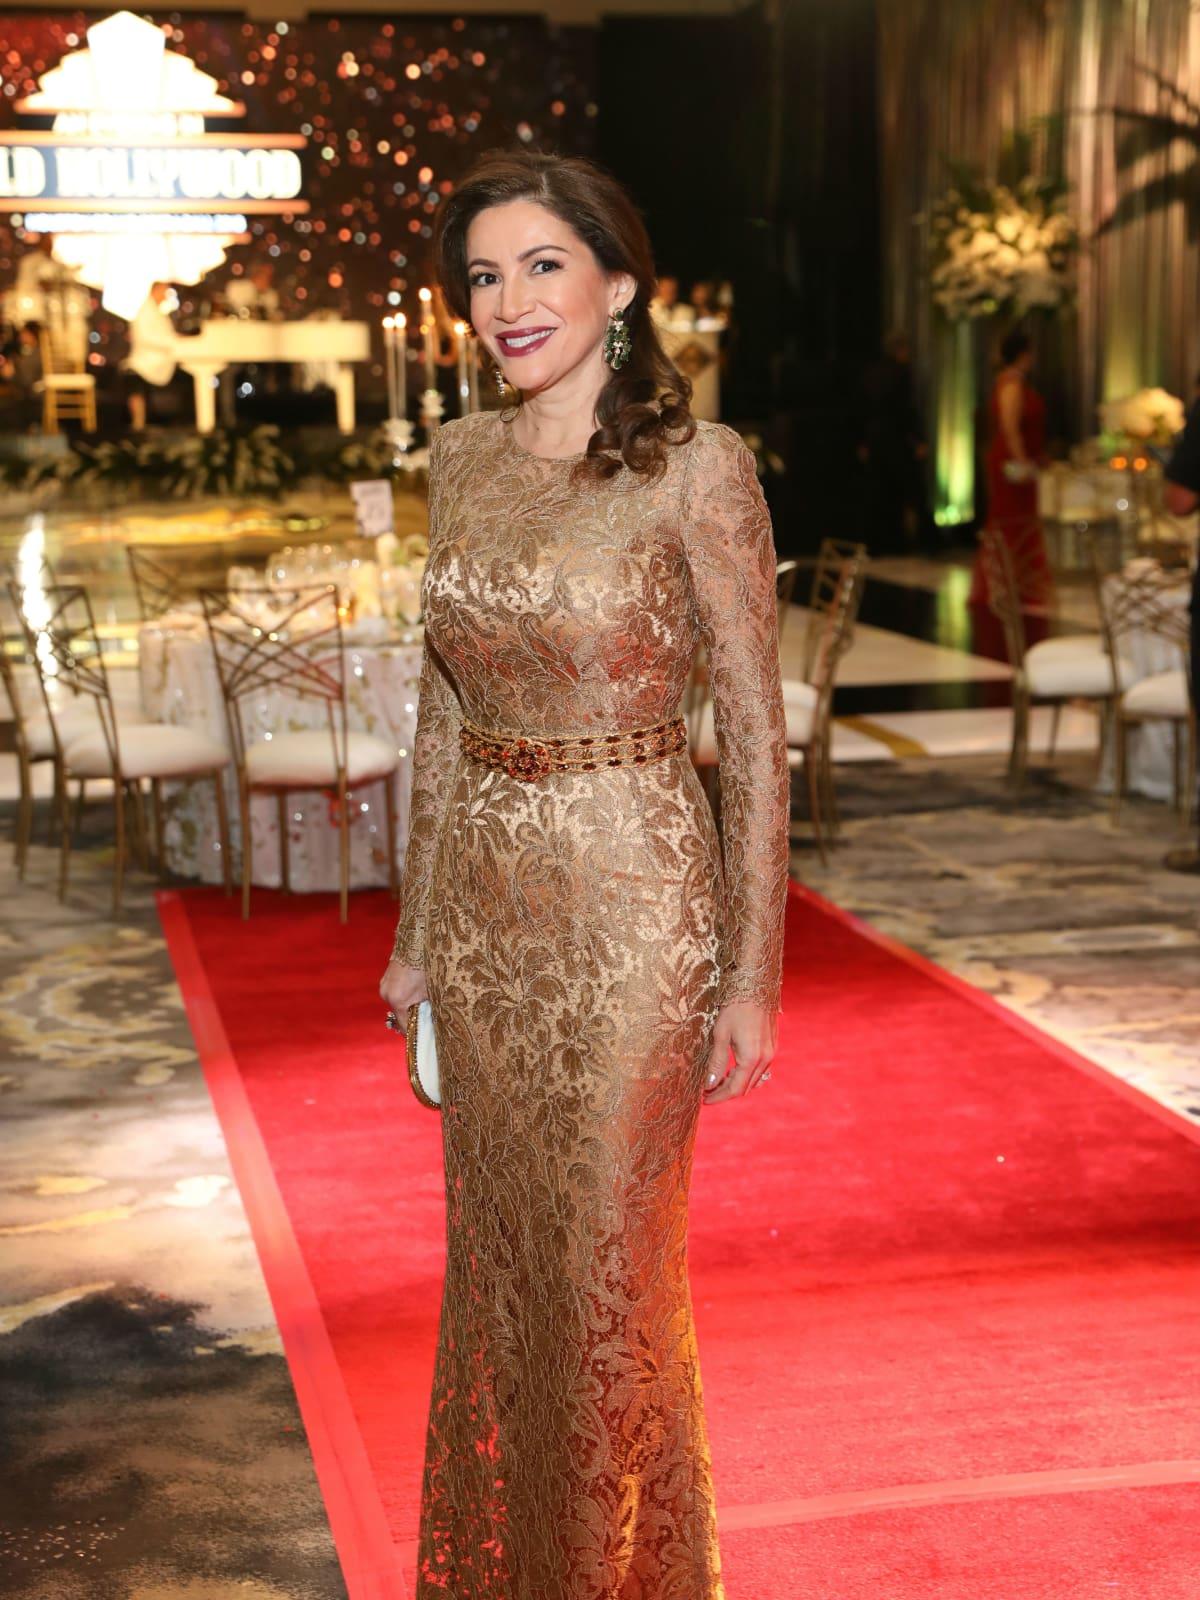 Opera Ball gowns Alex Blair in Dolce & Gabbana